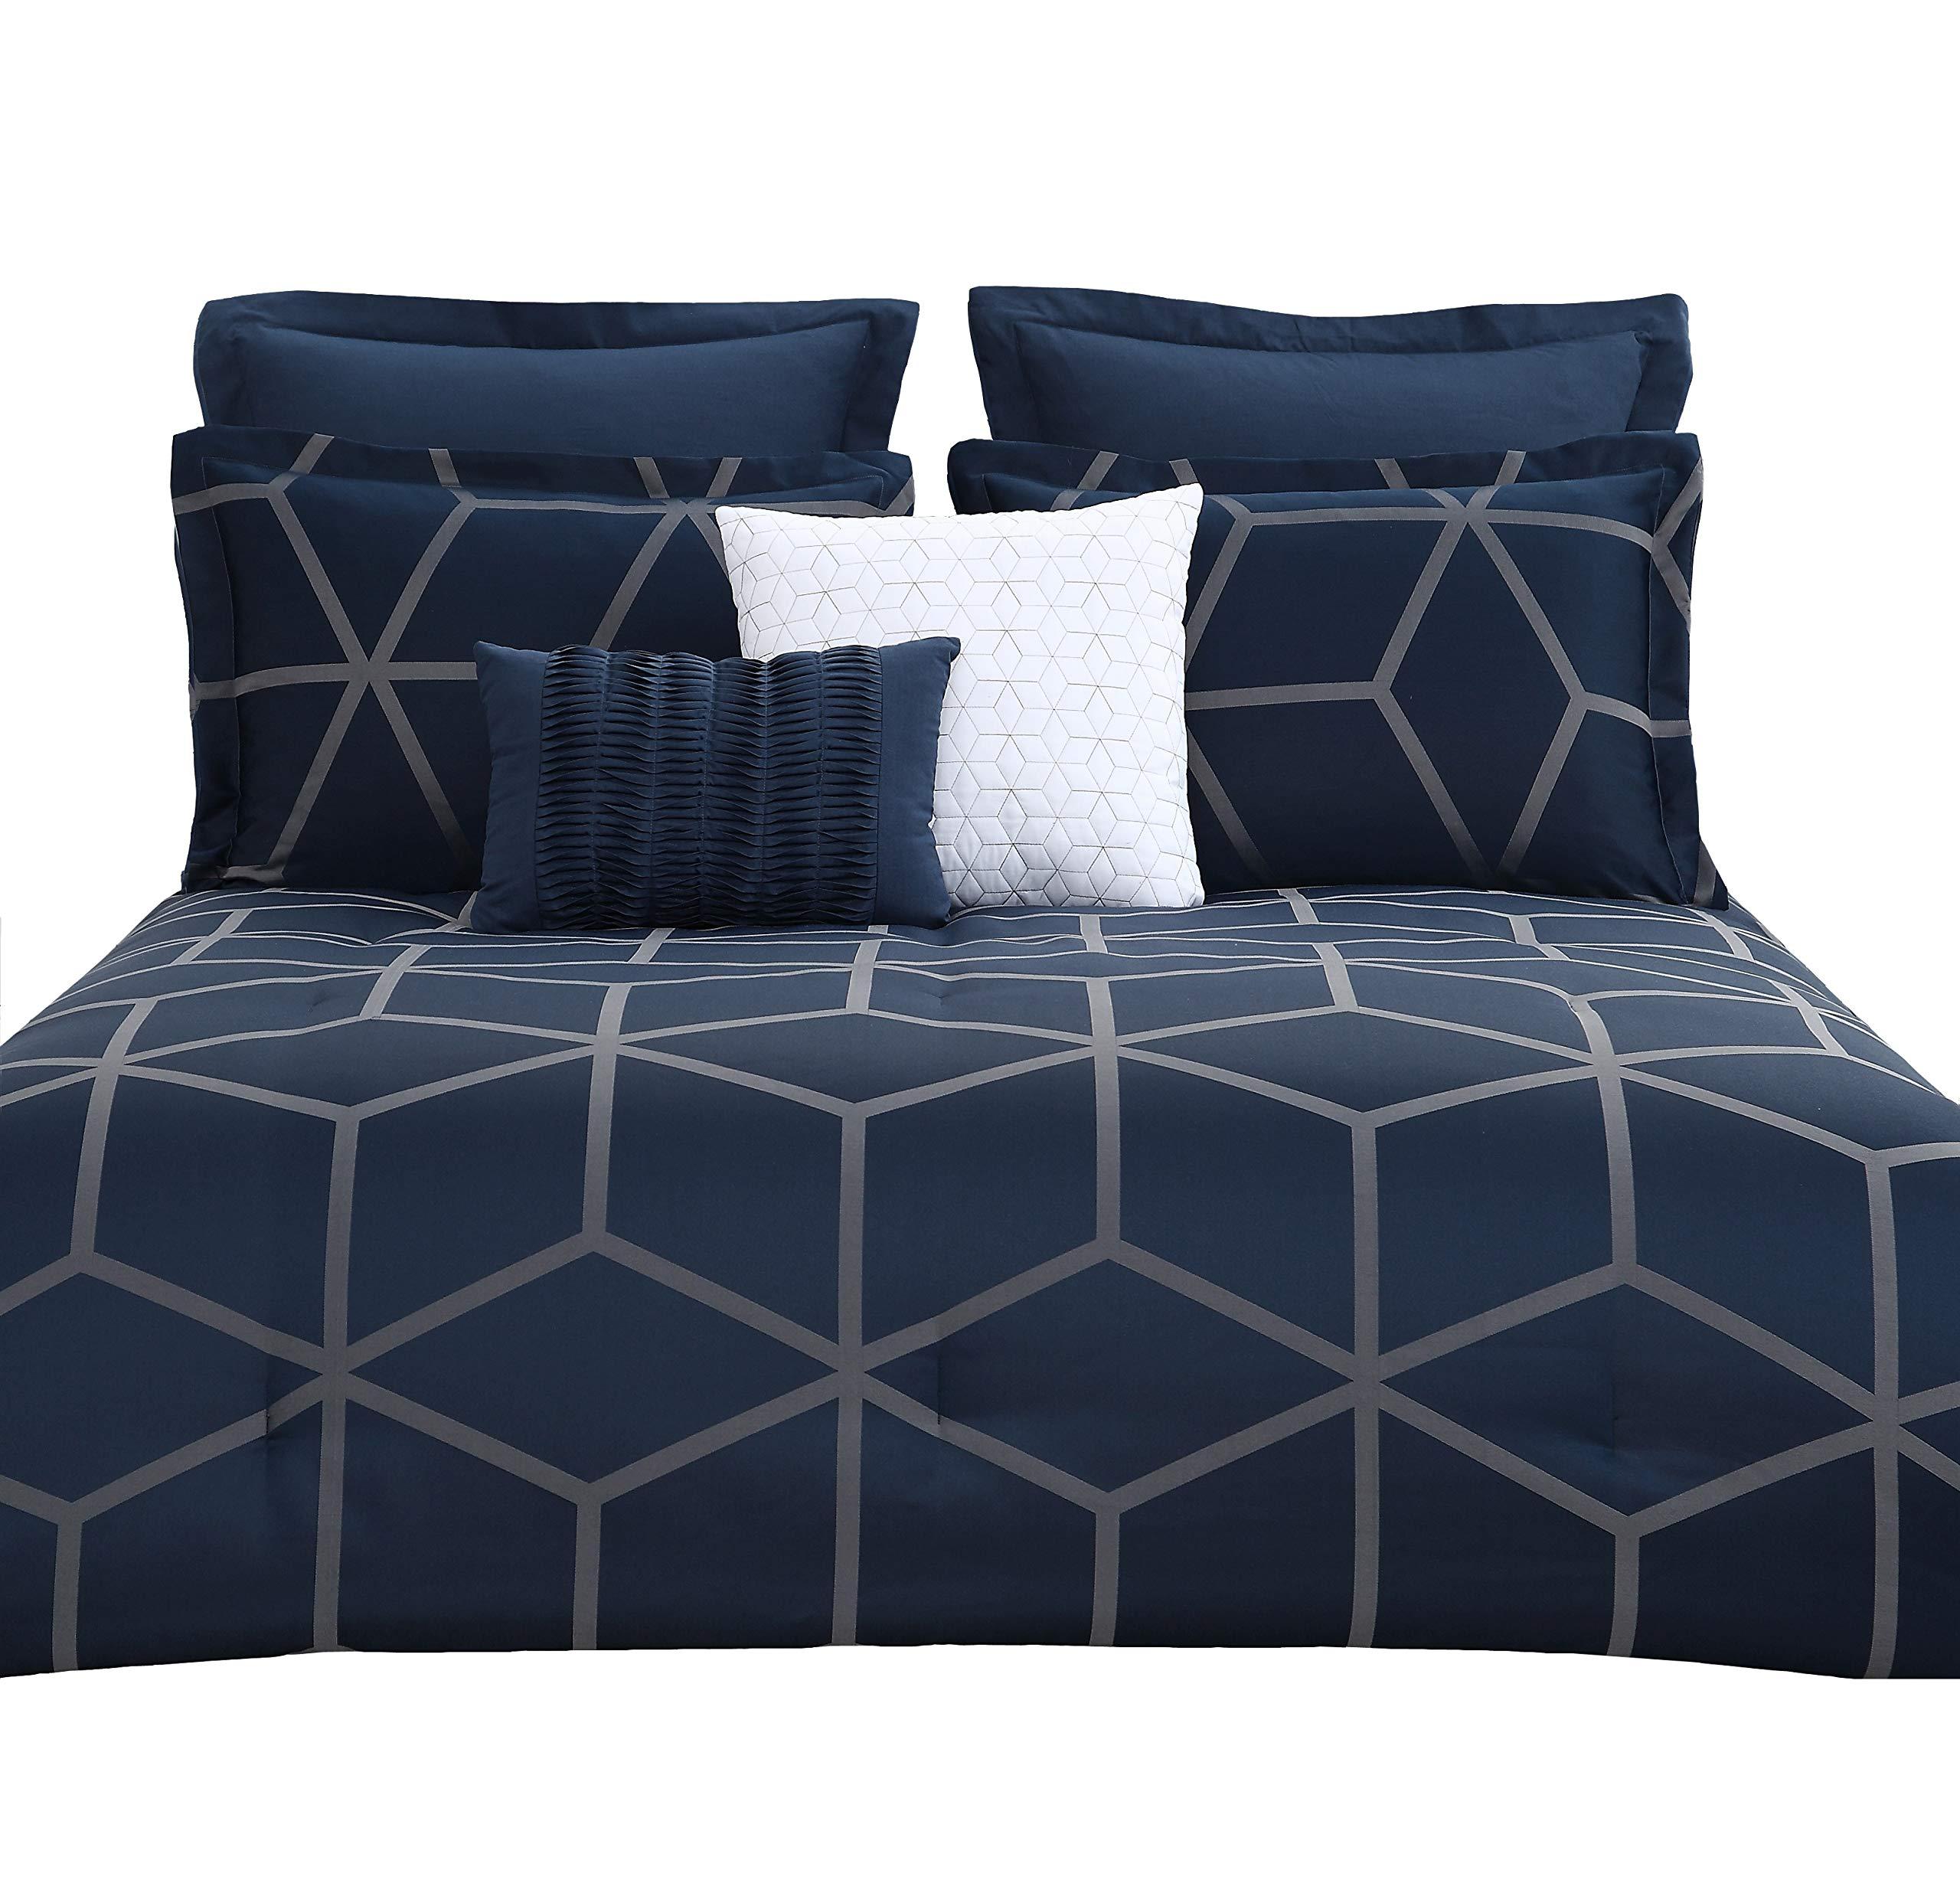 "Chezmoi Collection Corvo-Com-Navy-Queen 5 Pieces Modern Jacquard Geometric Lattice Pattern Bedding Comforter Set - Corvo by Chezmoi Collection 1 Comforter 90"" x 92""; 2 Shams 20"" x 26"" 1 Cushion 18"" x 18""; 1 Breakfast Pillow 12"" x 18"" - comforter-sets, bedroom-sheets-comforters, bedroom - 819faQiRjHL -"